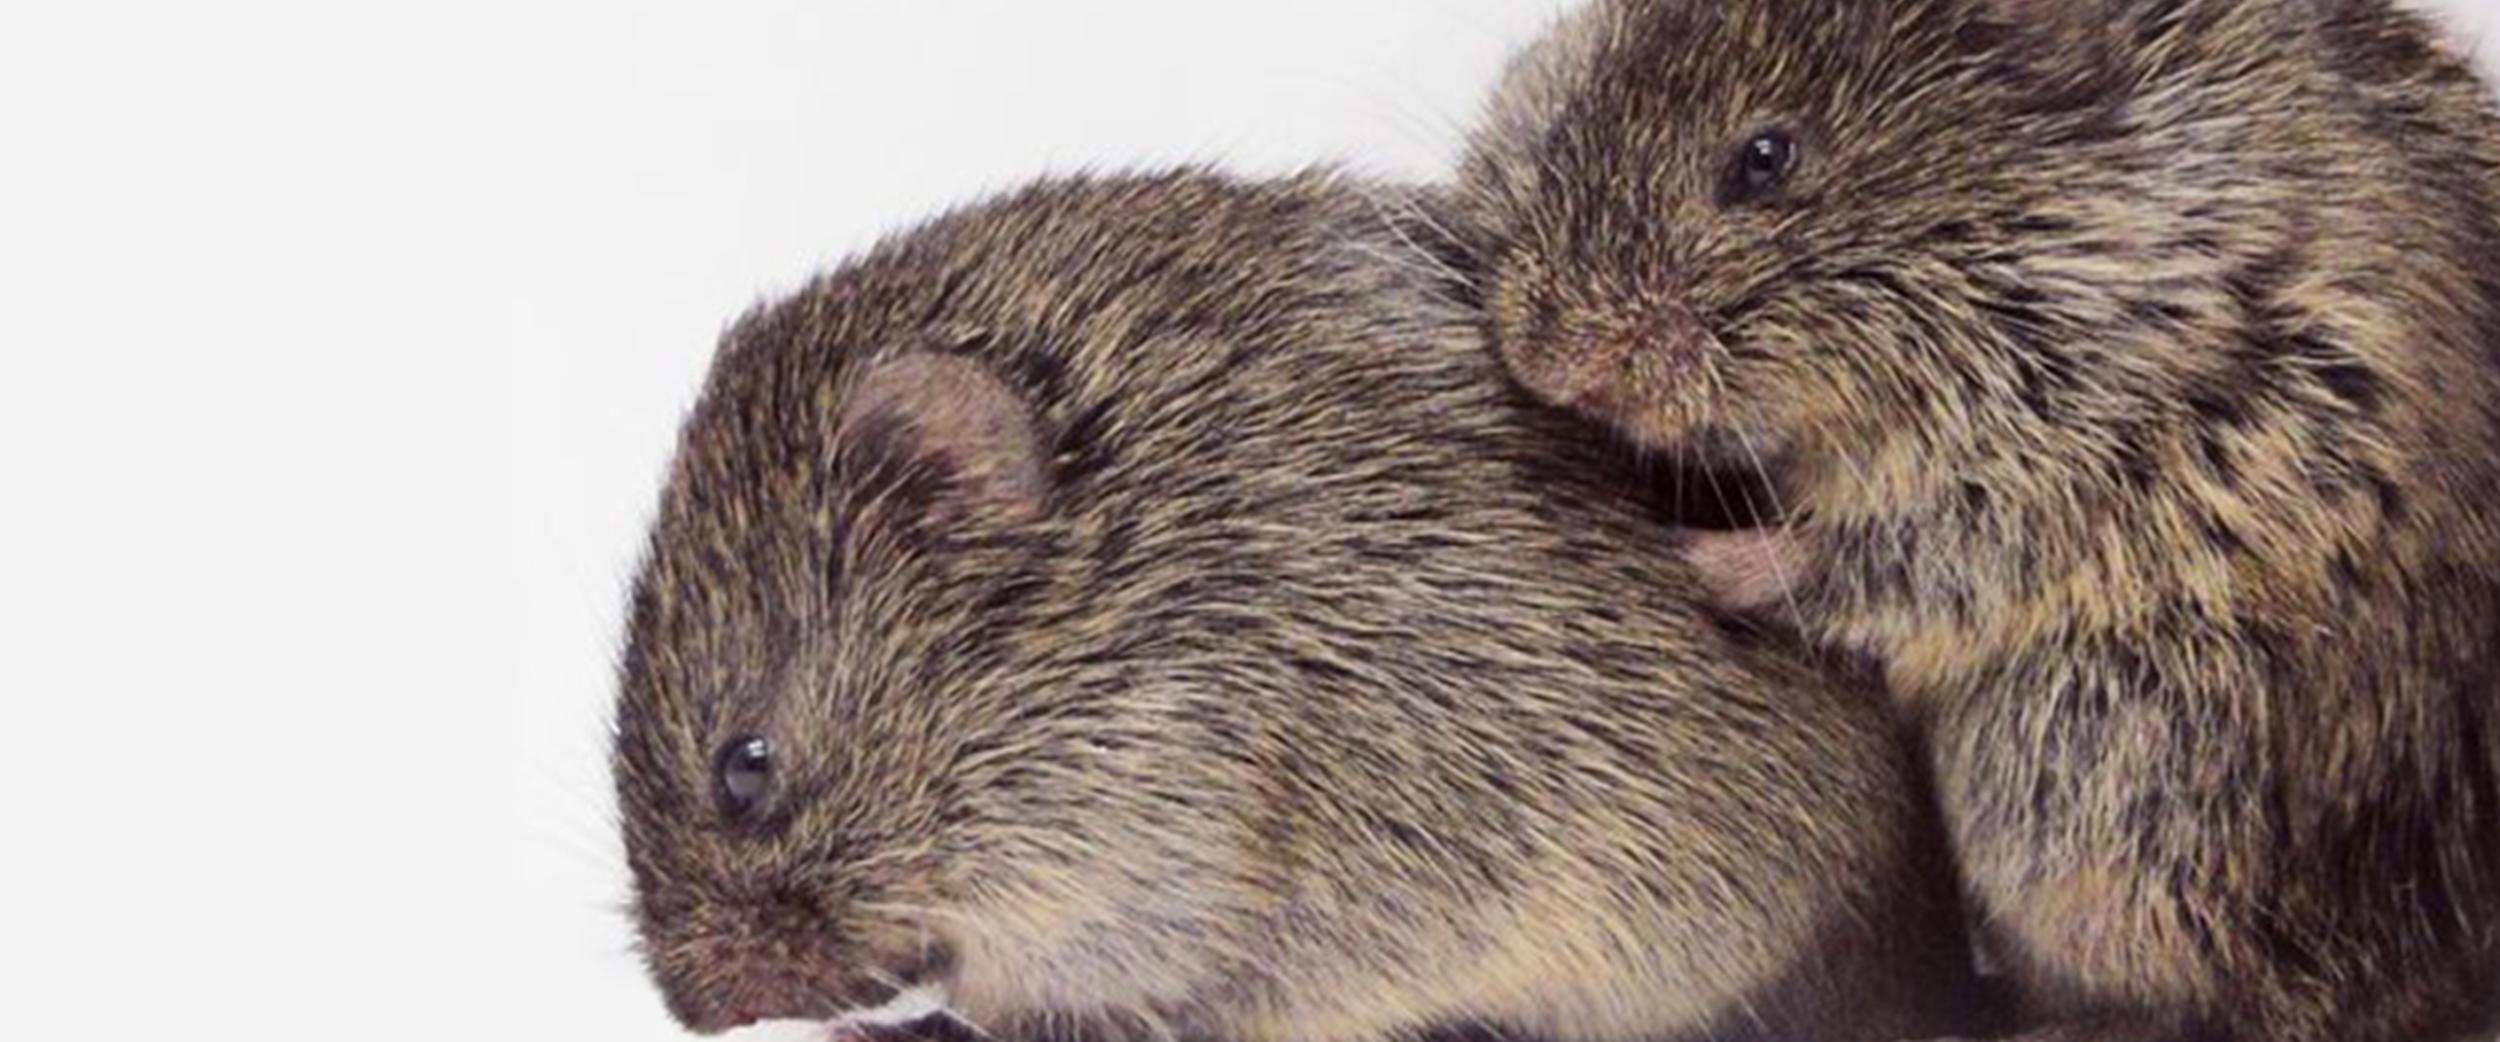 Neurobiology of Love - Prairie Voles